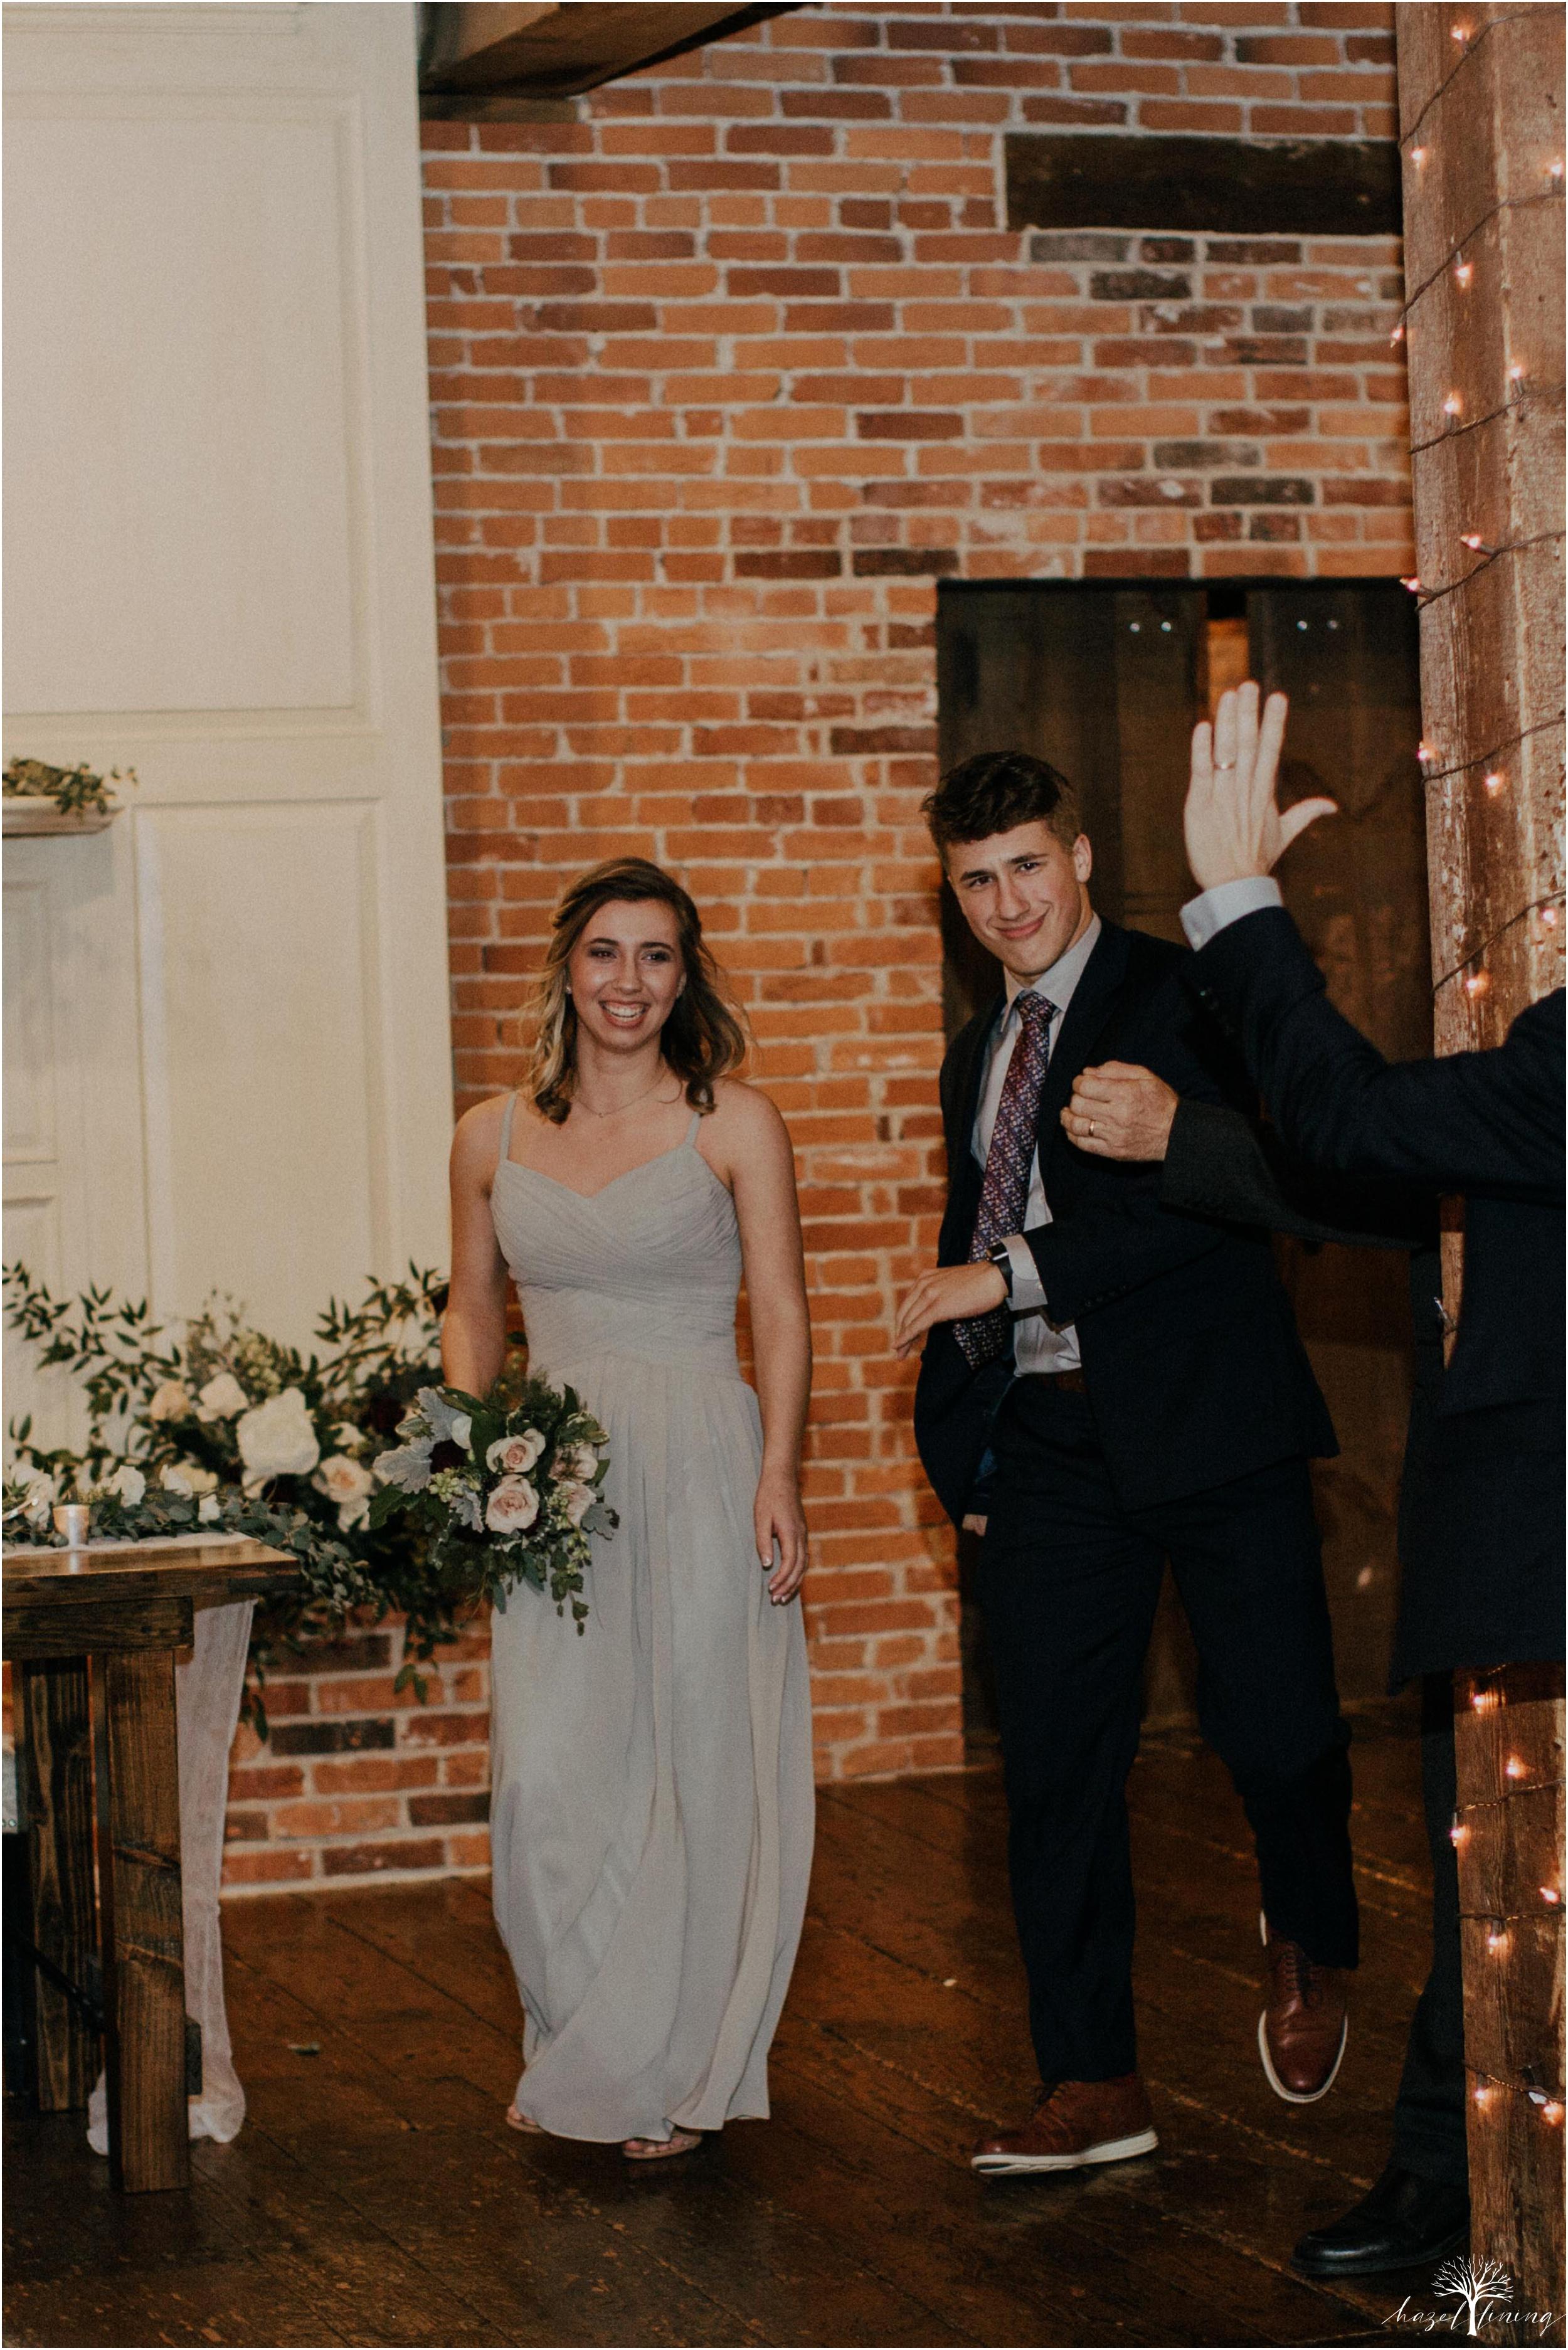 emma-matt-gehringer-the-booking-house-lancaster-manhiem-pennsylvania-winter-wedding_0136.jpg